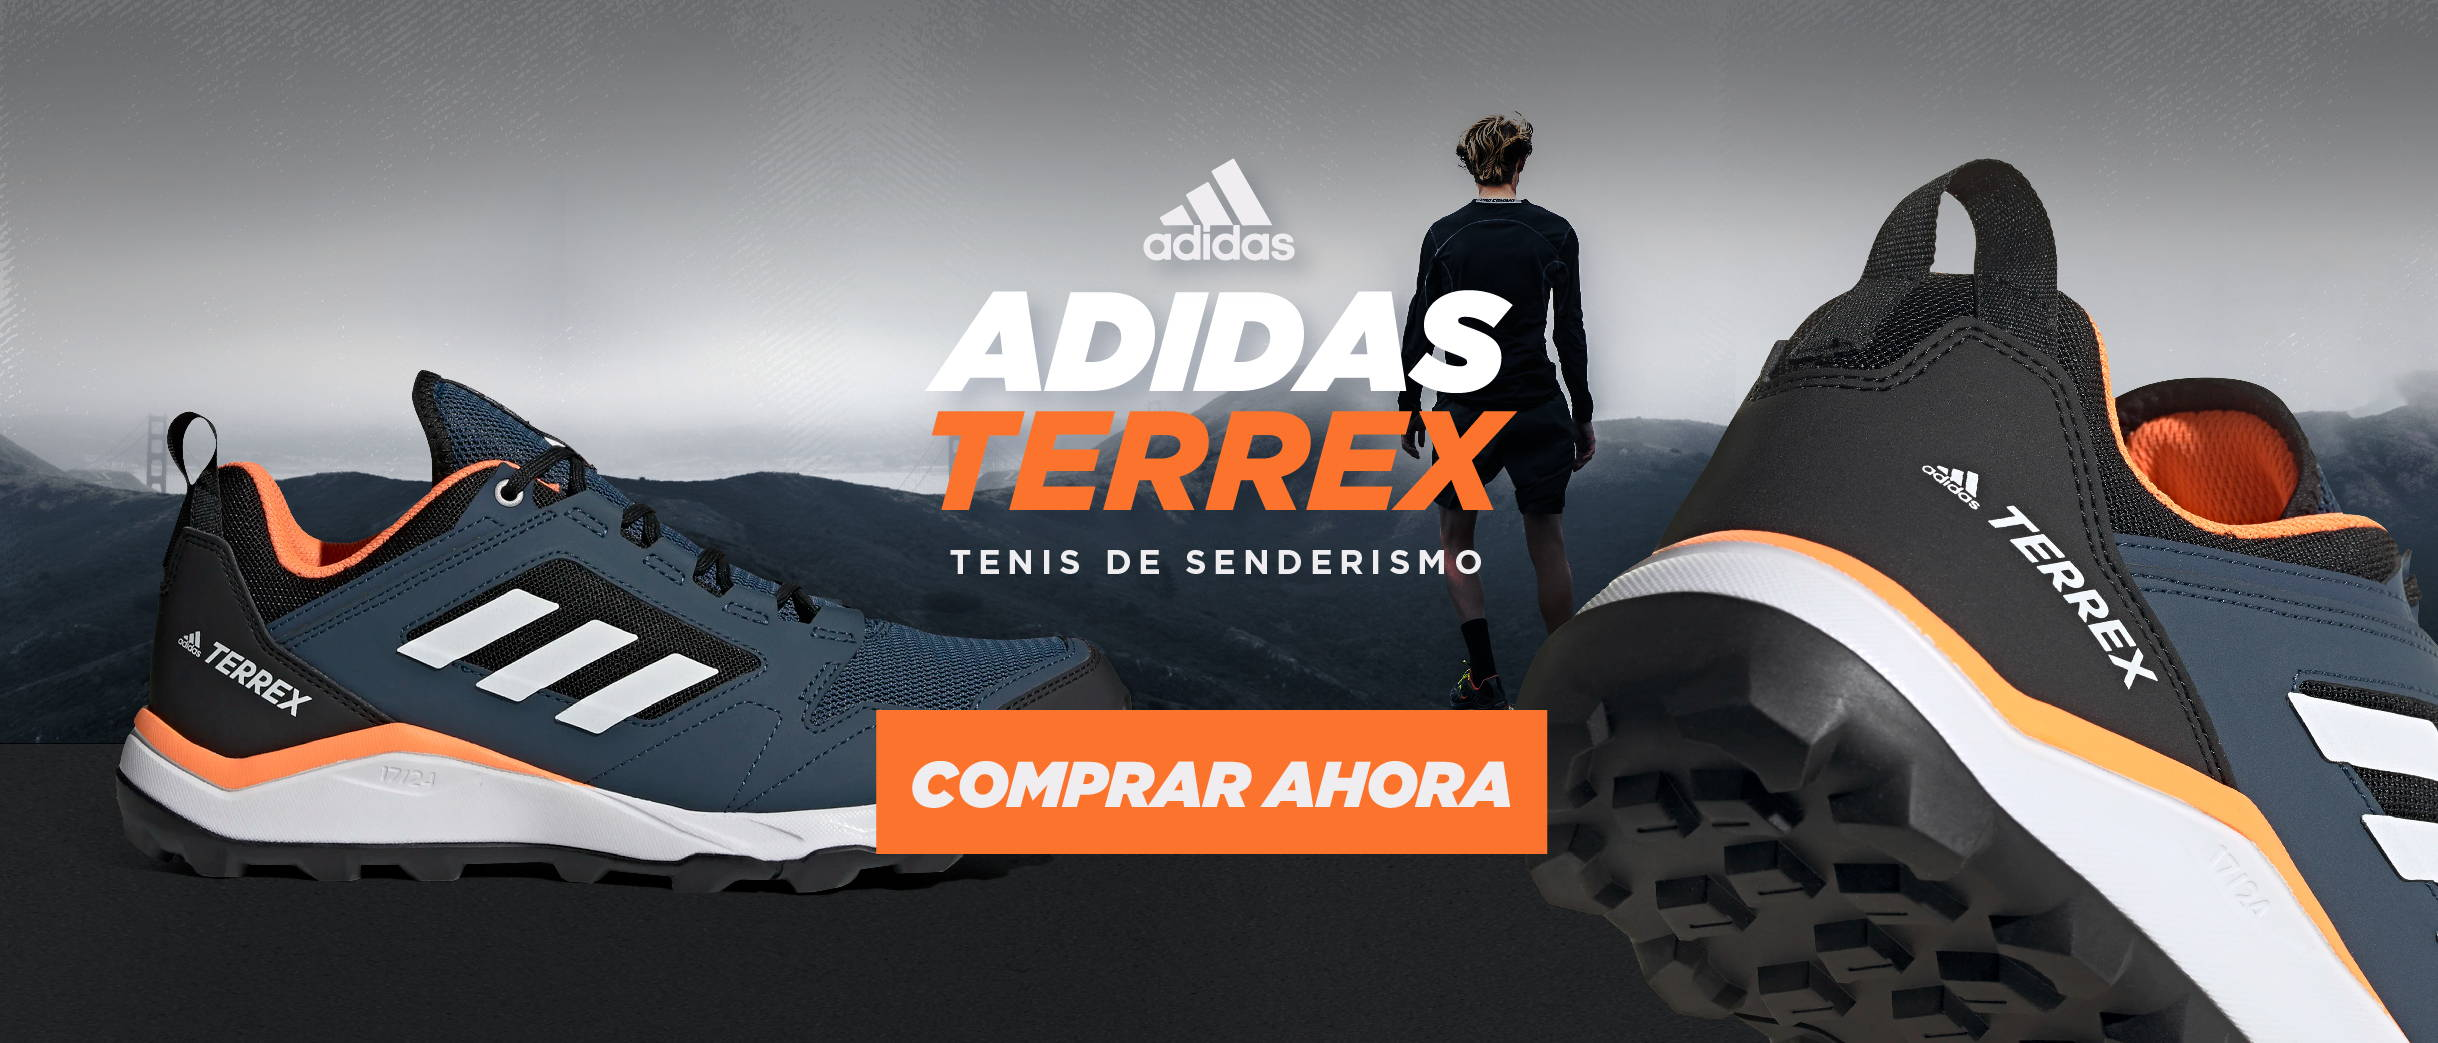 Adidas Terrex Tenis de senderismo Runner